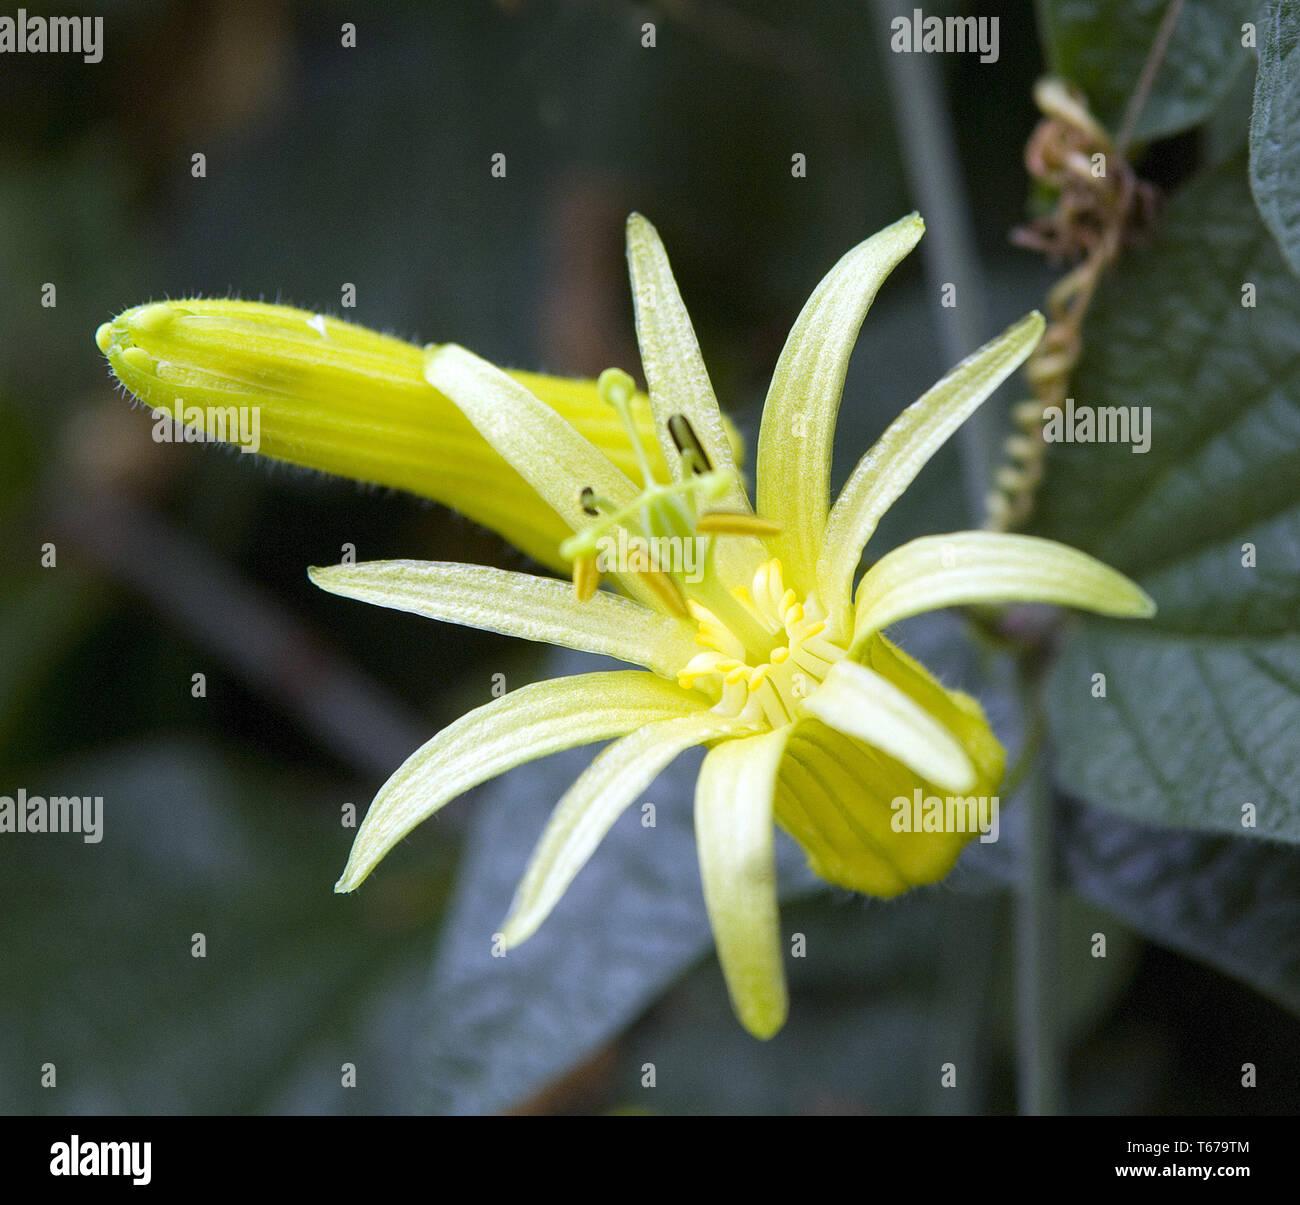 yellow passionflower / passion flower [Passiflora lutea] Stock Photo